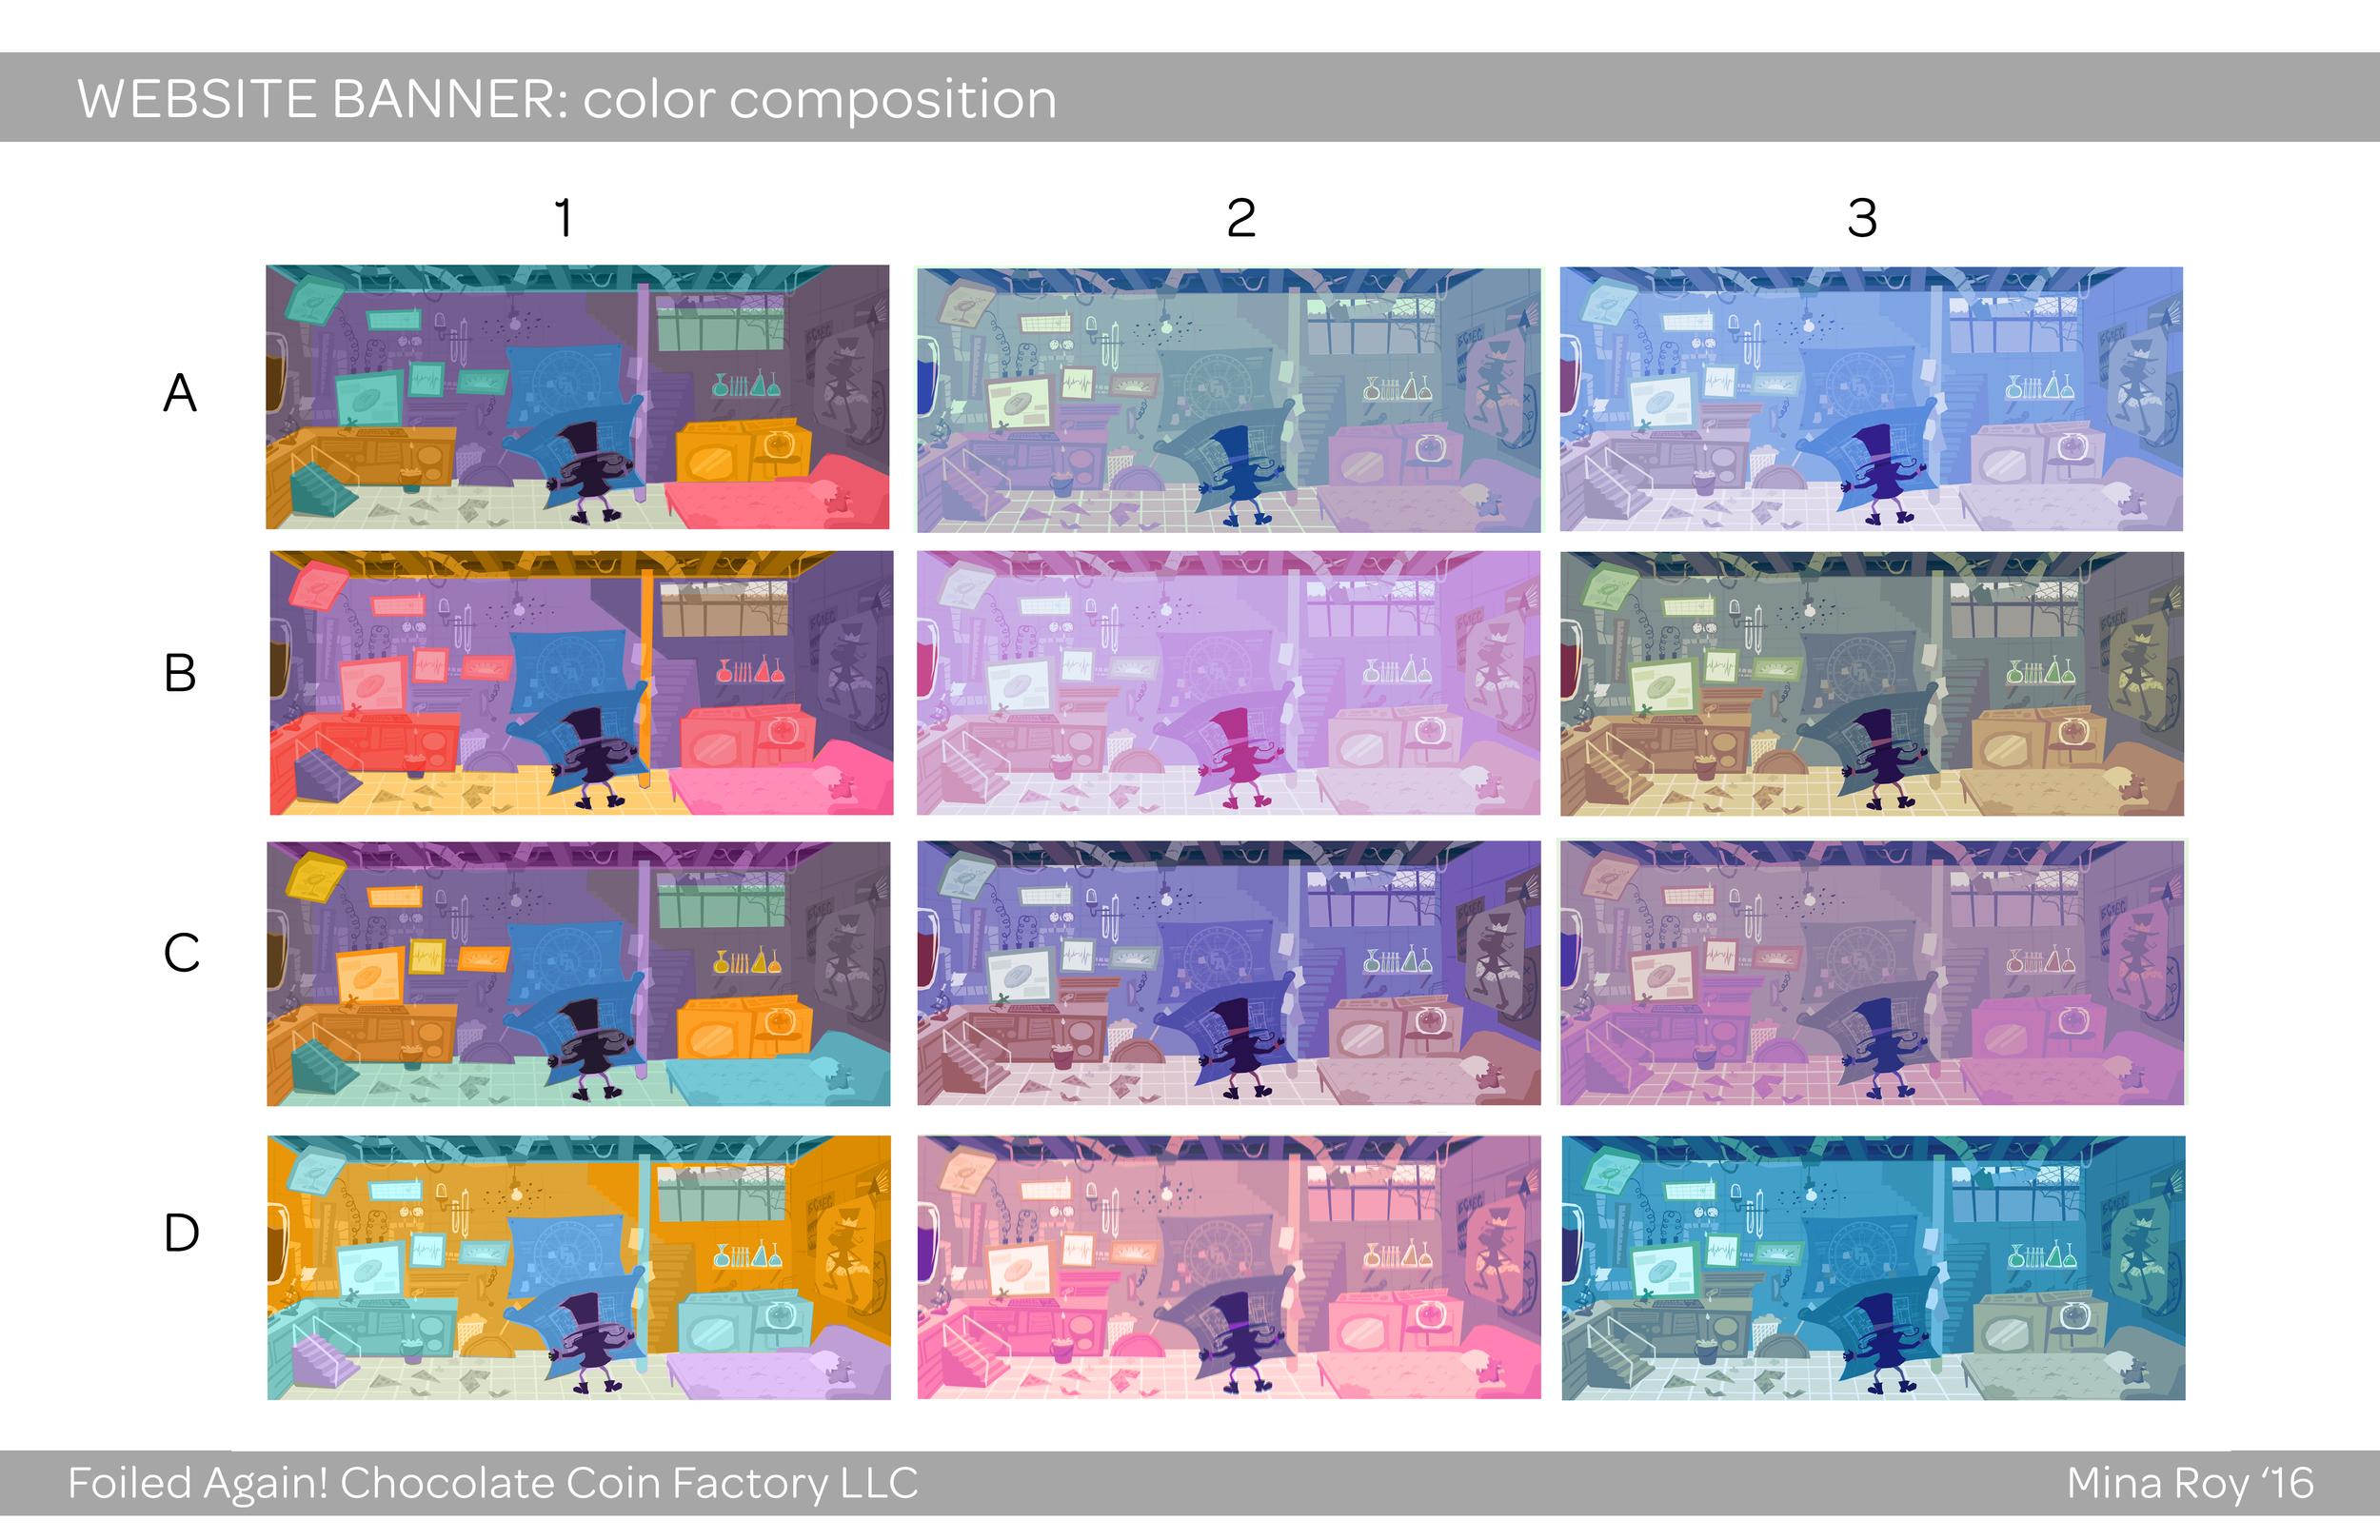 website banner-colorcomposition-presentation.jpg